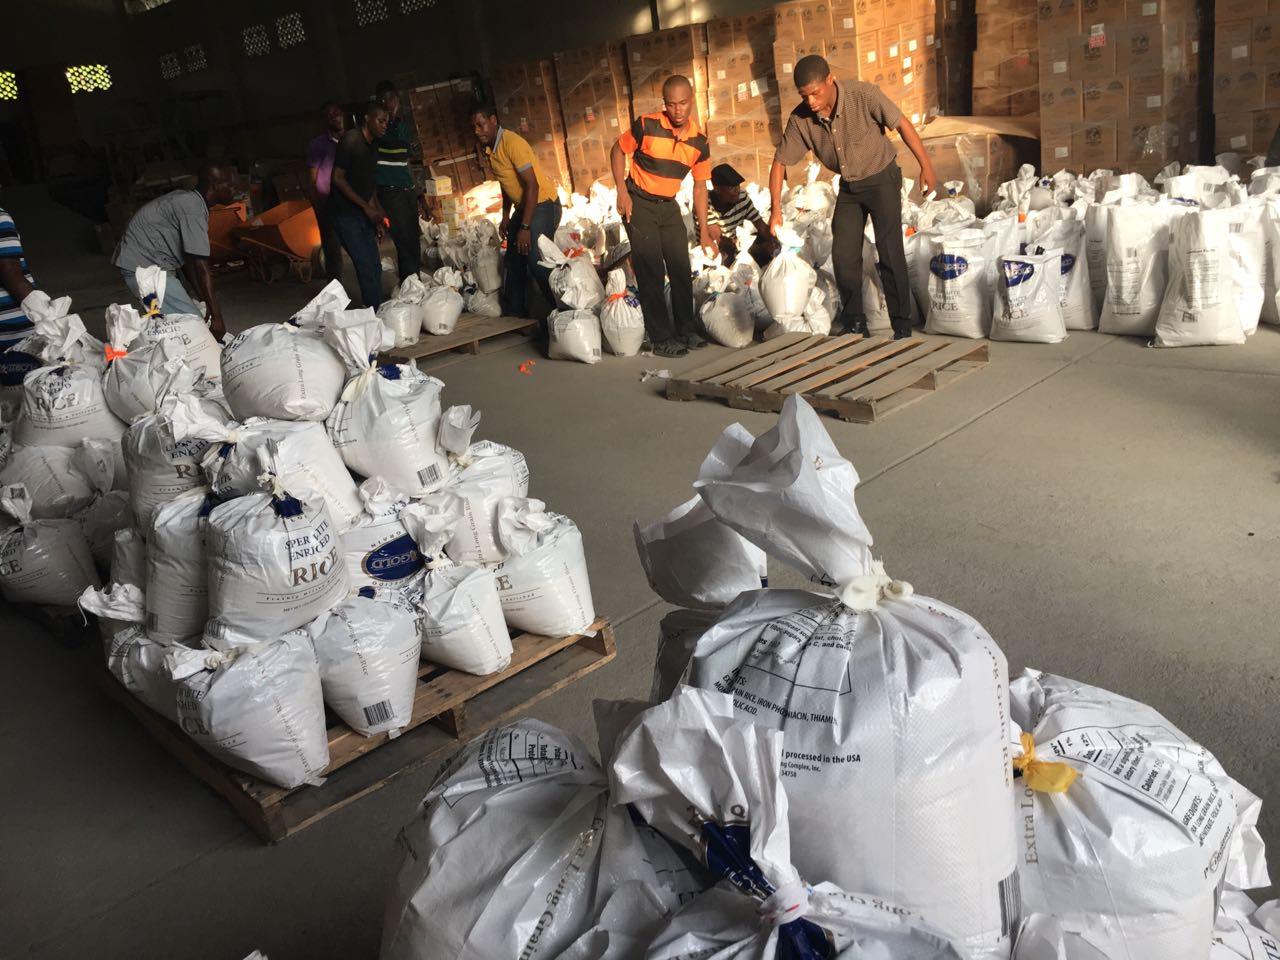 HAITI: Missionaries Distribute Survival Kits, Fear Cholera Outbreak